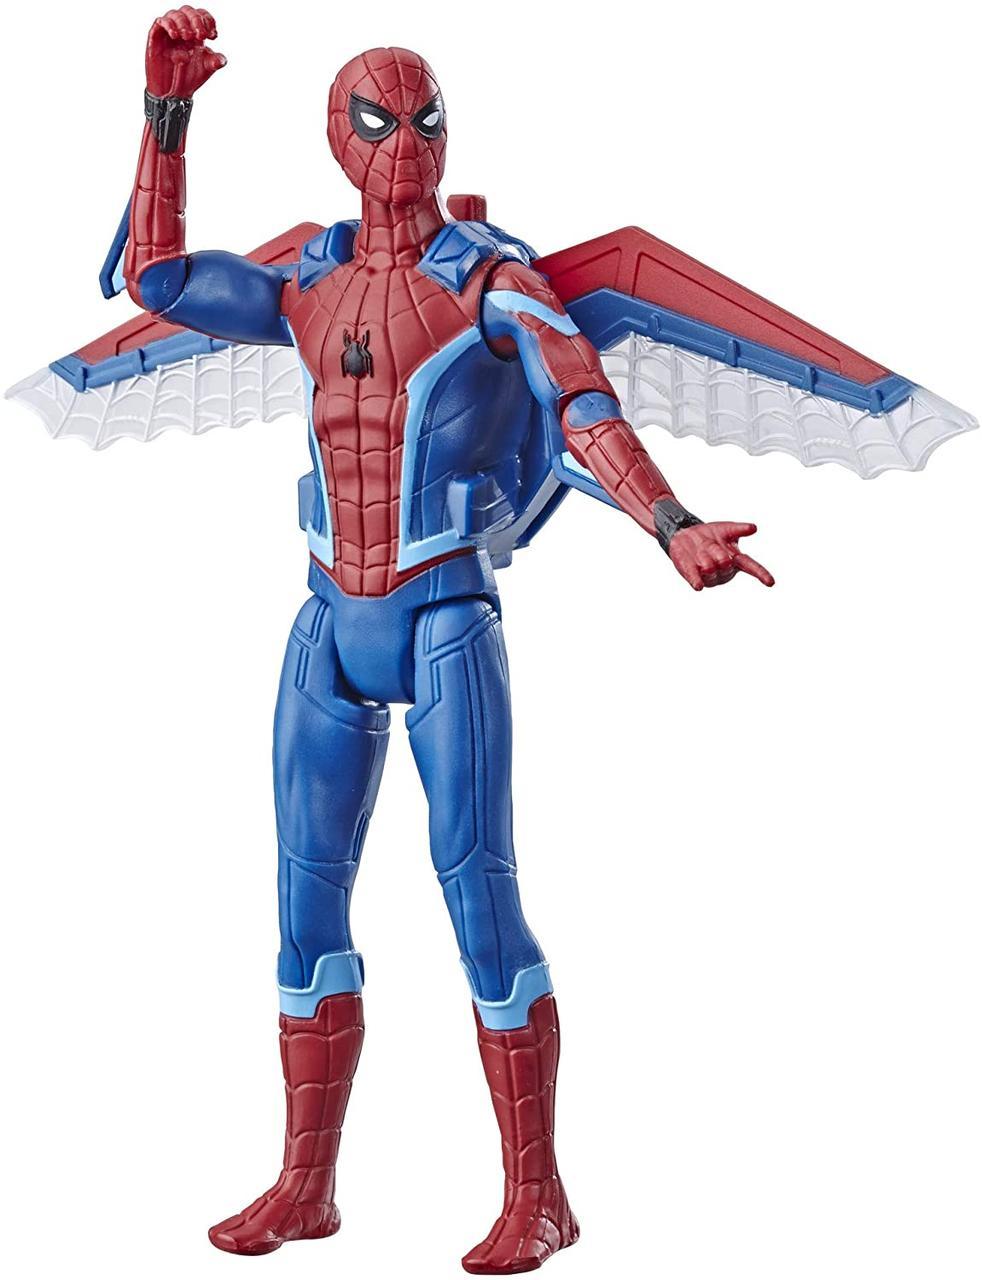 Фігурка Hasbro Людина Павук в костюмі-глайдері 15 см - Spider-Man: Far from Home Concept Series Glider